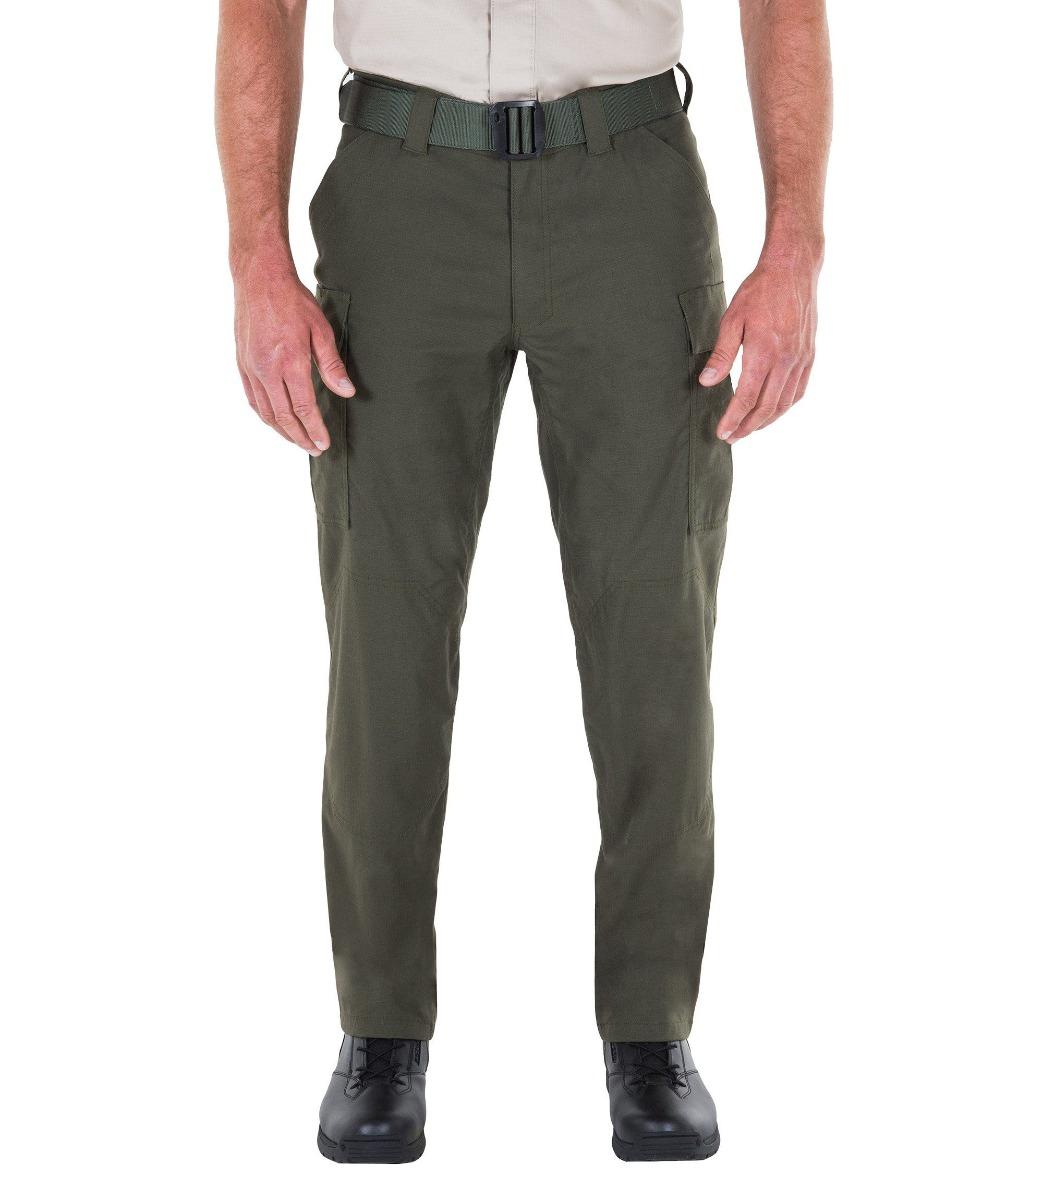 First Tactical BDU Pant Image